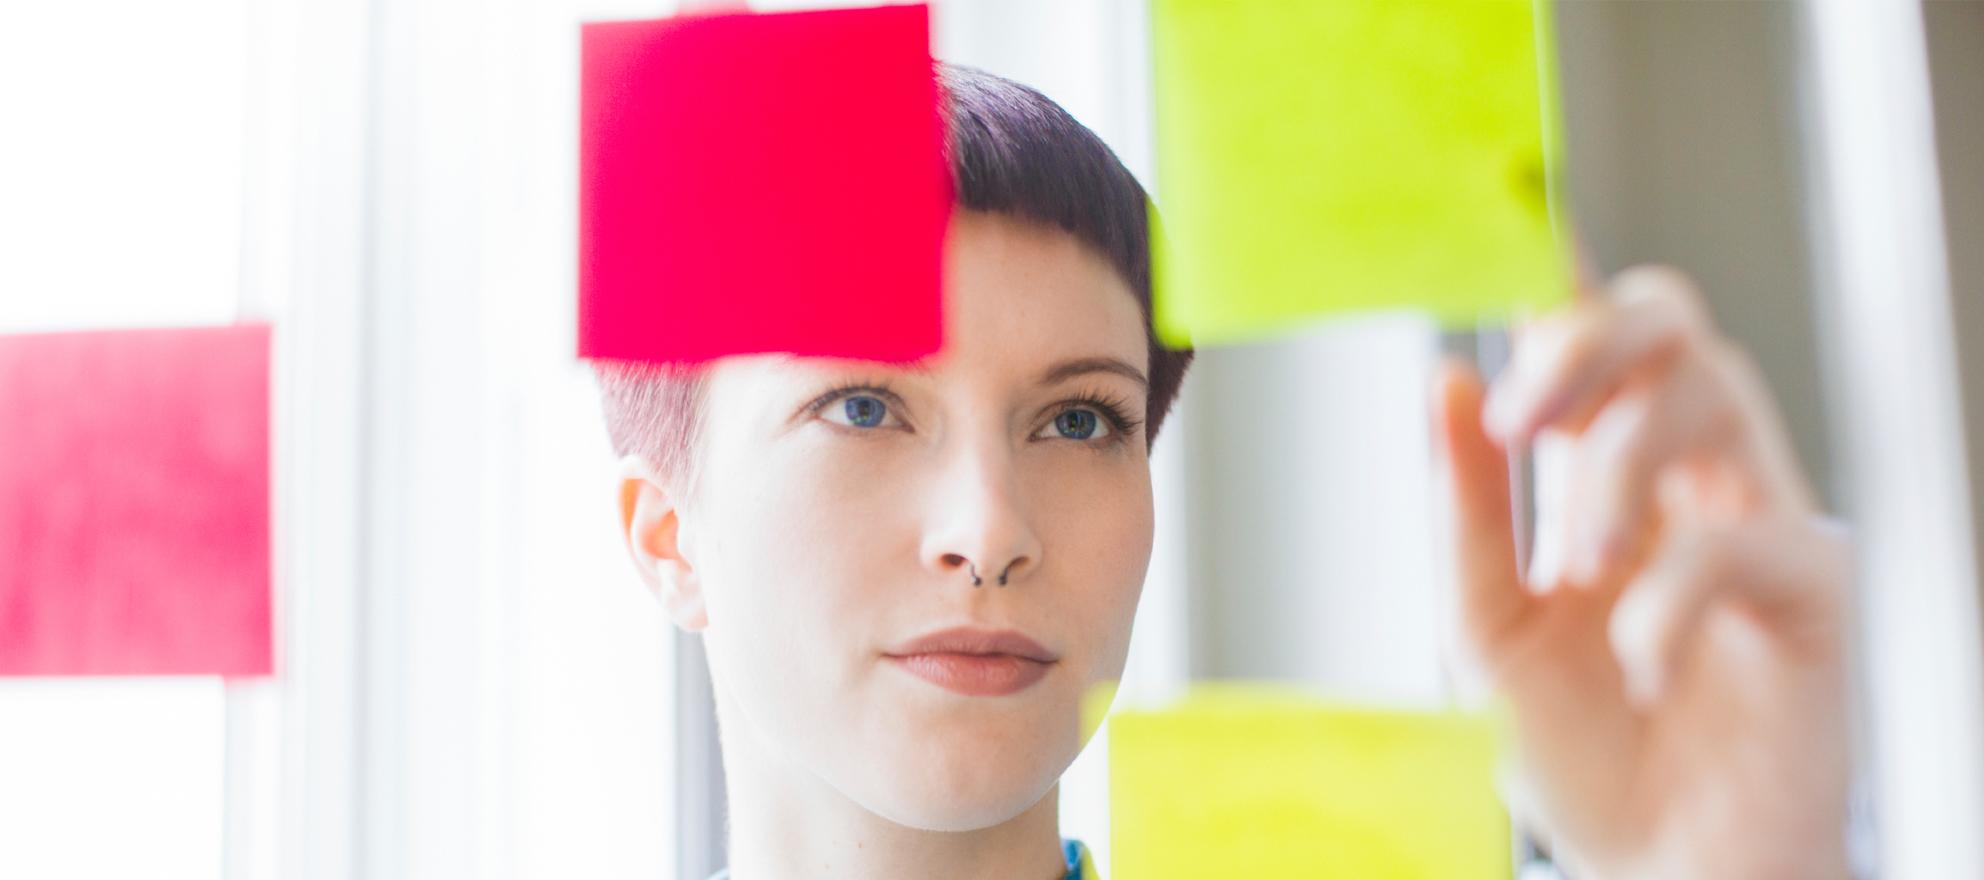 neuroscience real estate app development